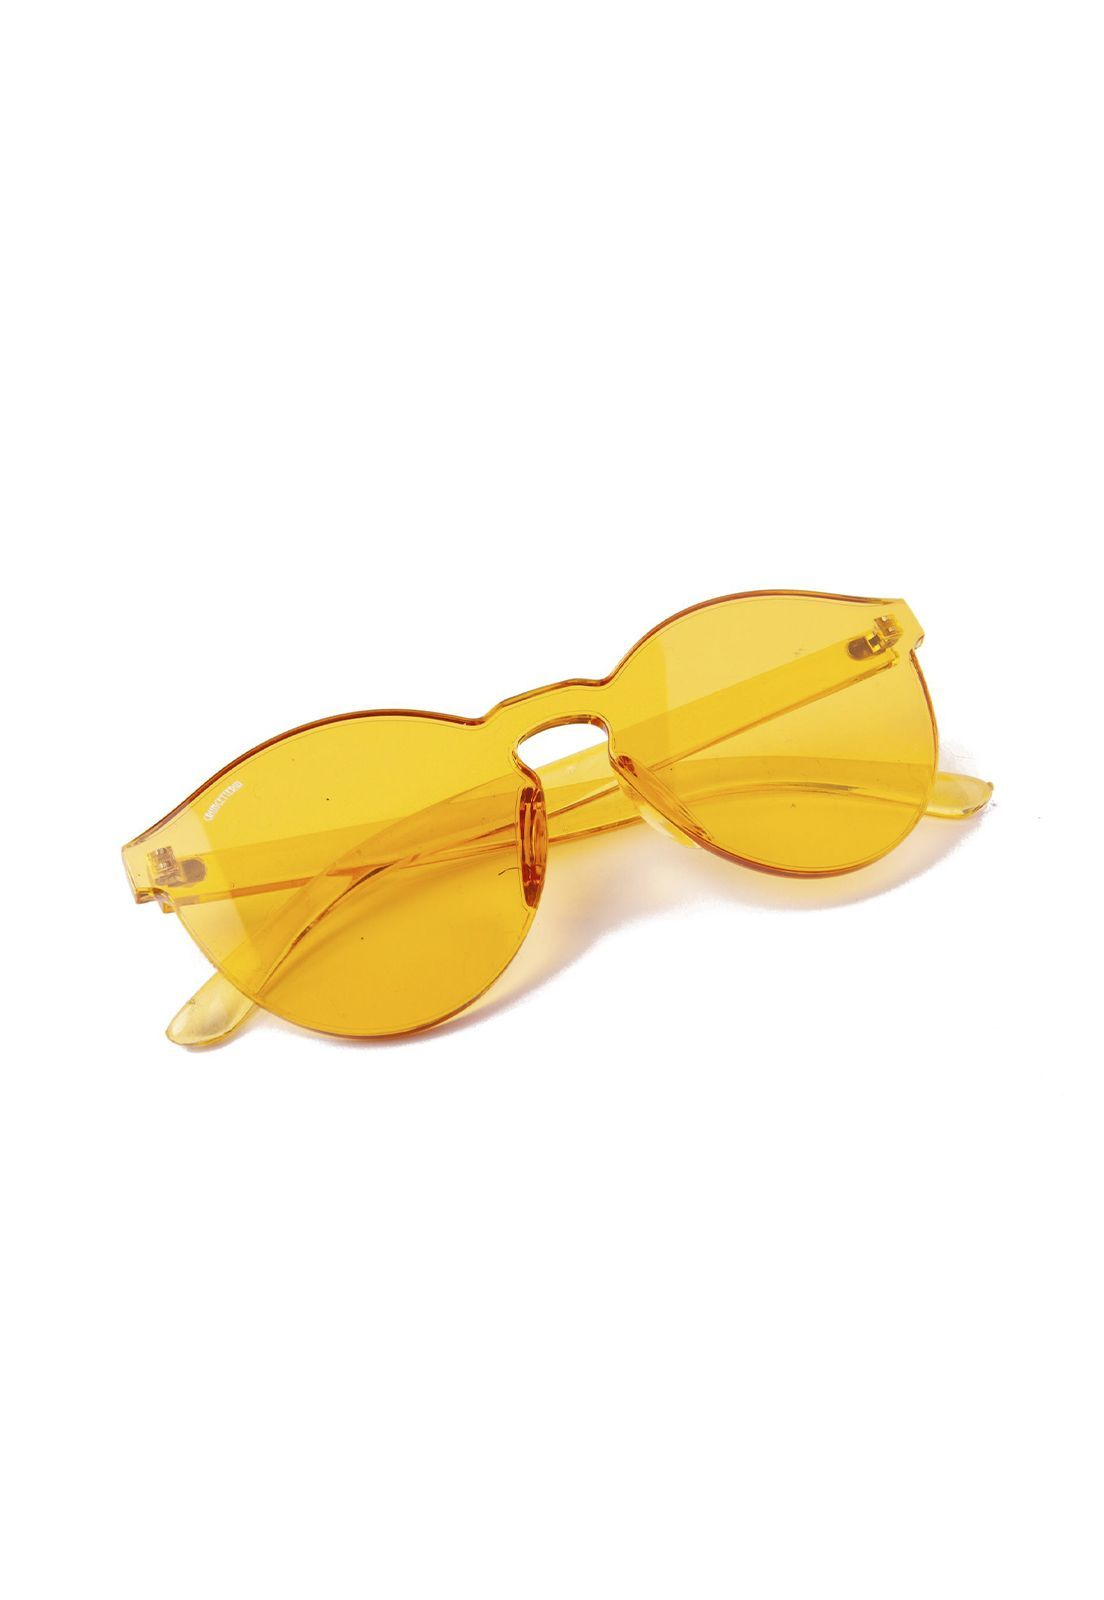 Óculos de Sol Grungetteria Mojo Laranja